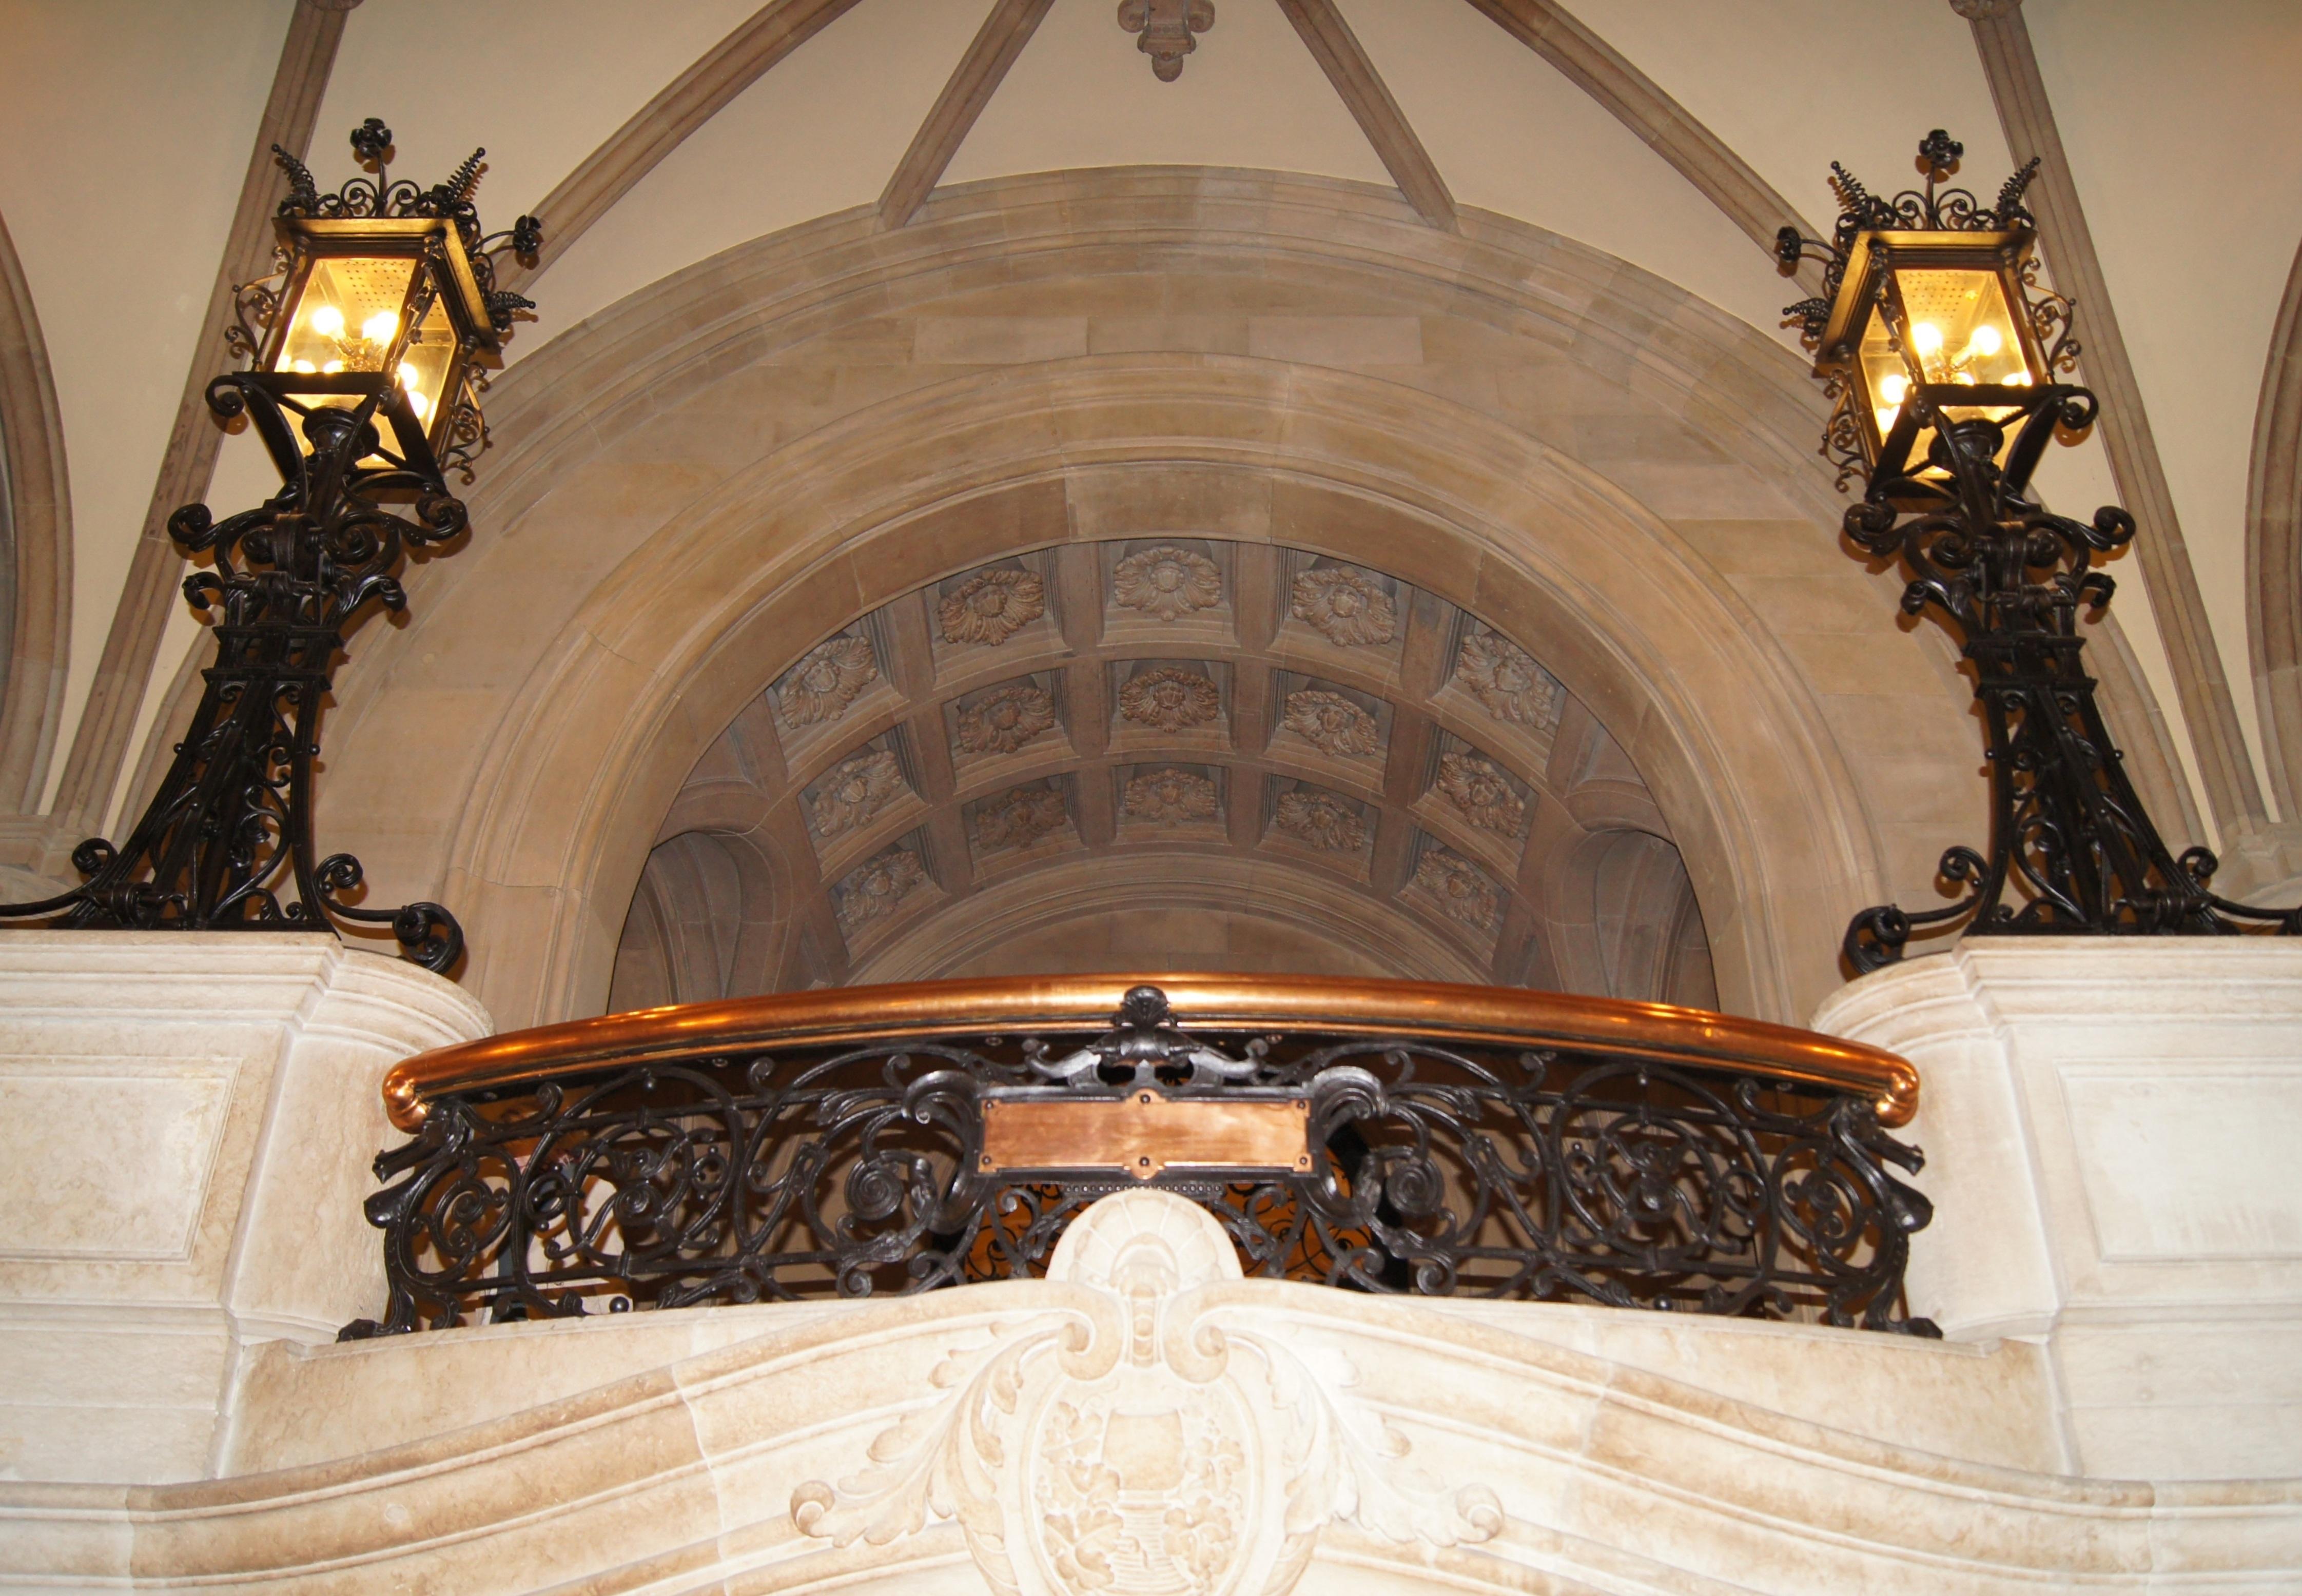 Fotos Gratis Madera Antiguo Balc N Arco Techo Capilla  # Muebles Renacentistas